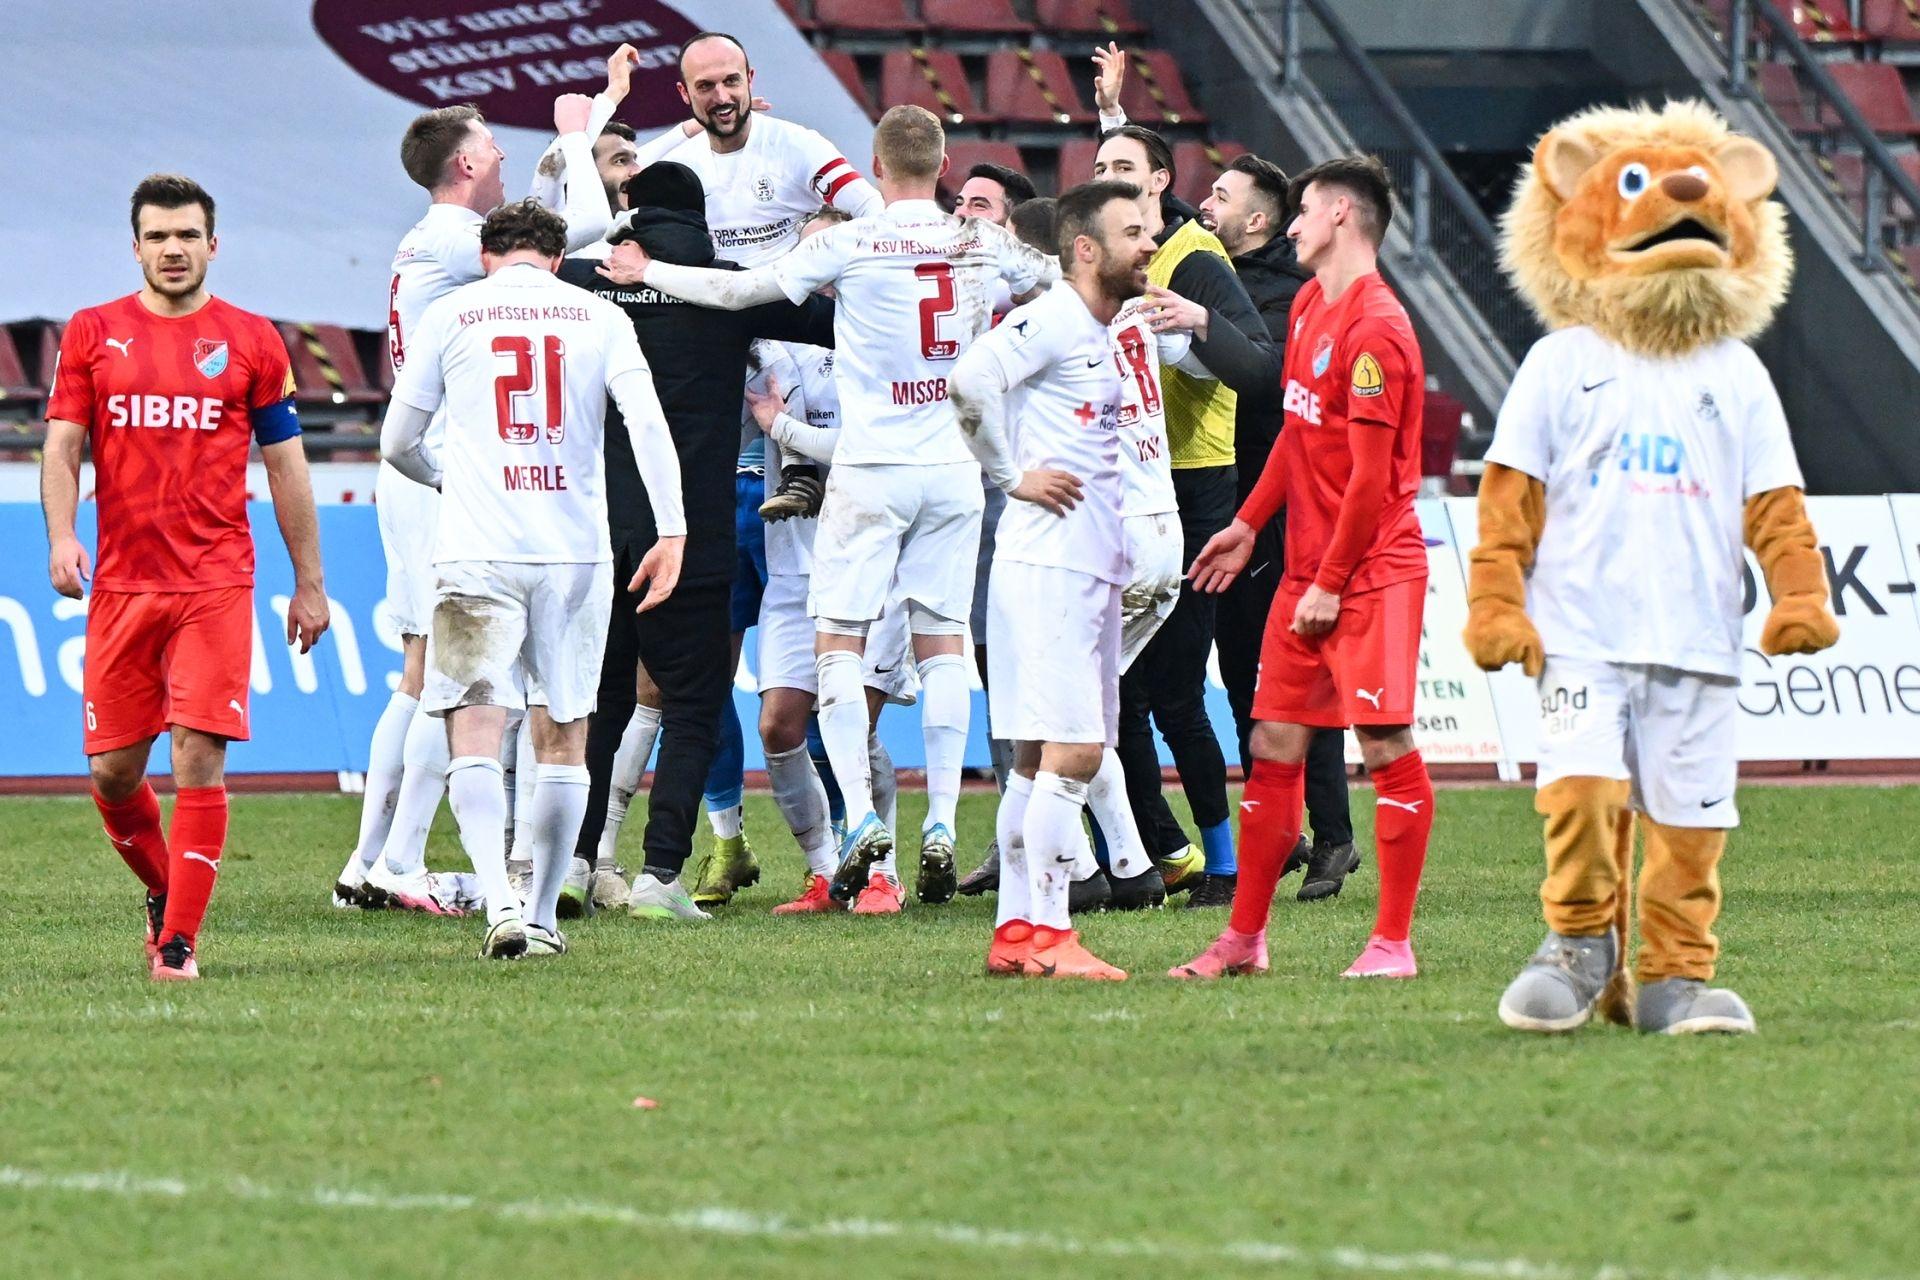 Regionalliga Südwest 2020/21, KSVHessen Kassel, TSV Steinbach Haiger, Endstand 2:1, Totti, Sergej Evljuskin, Kreis, Jubel